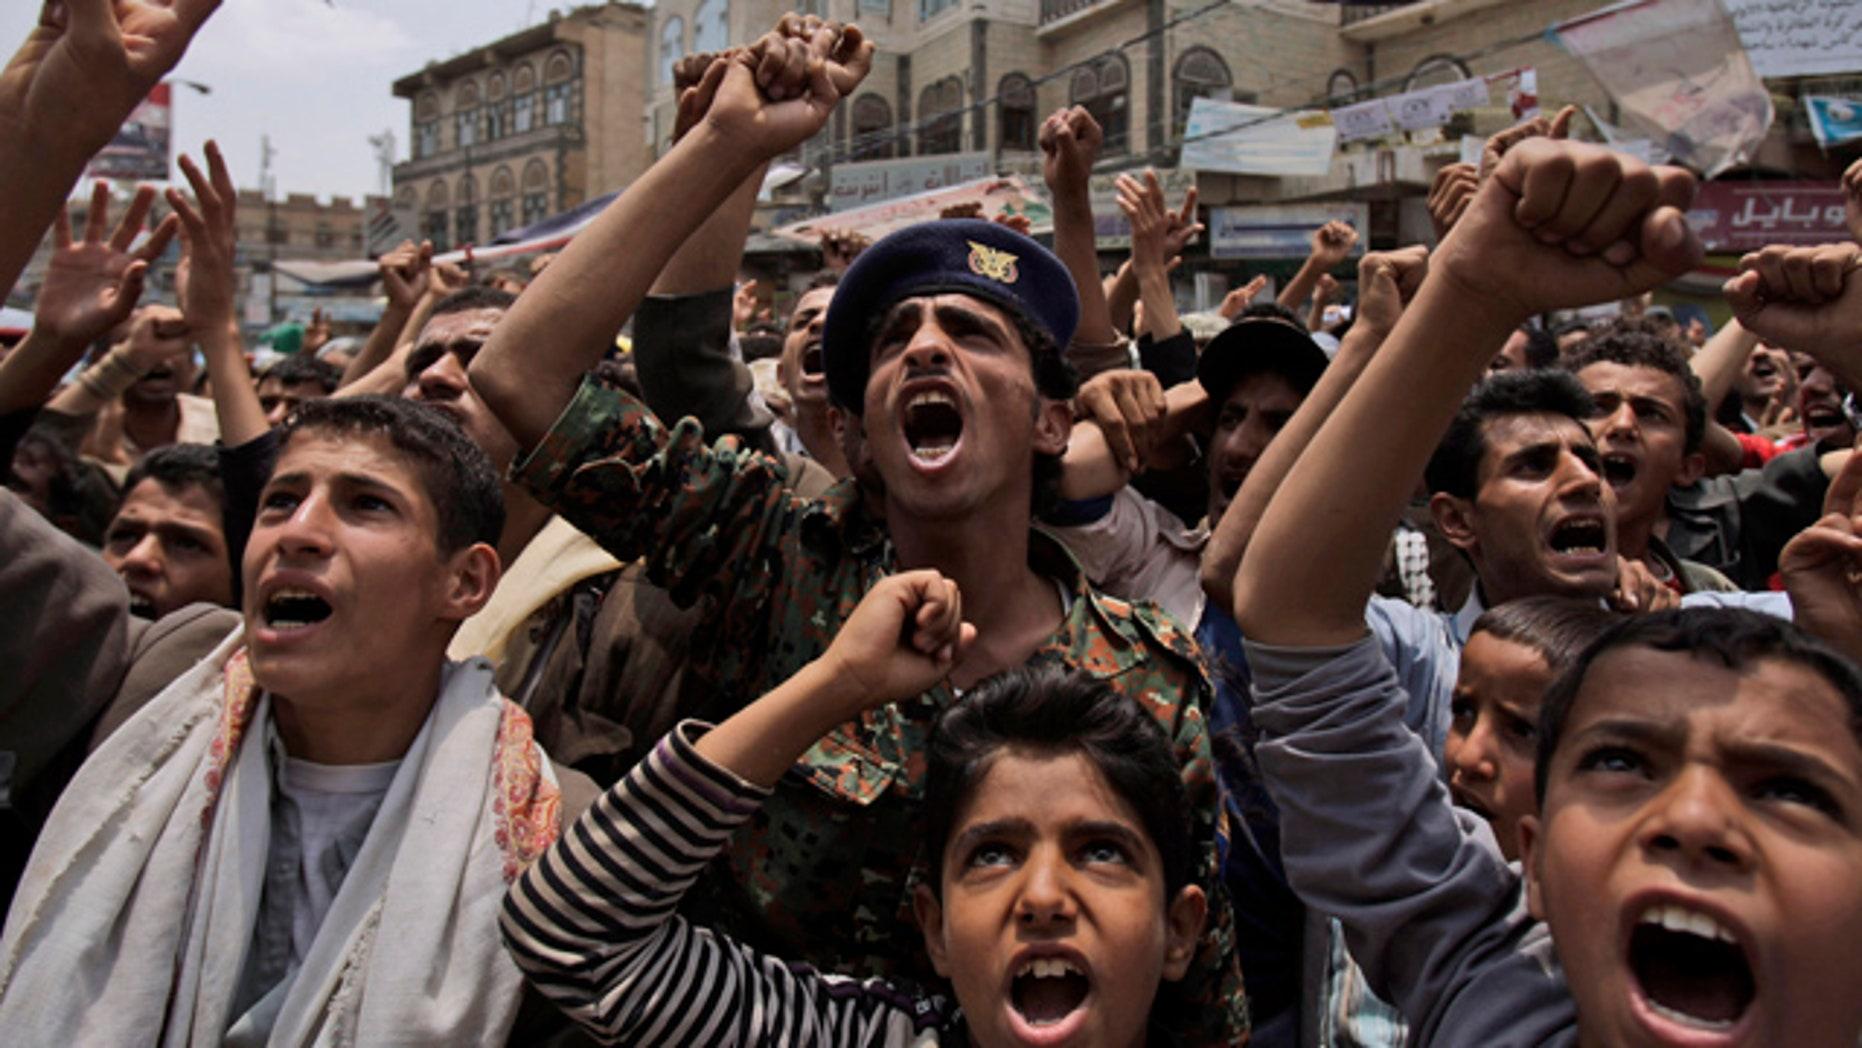 June 29: Anti-government protestors shout slogans during a demonstration demanding the resignation of Yemeni President Ali Abdullah Saleh in Sanaa, Yemen.